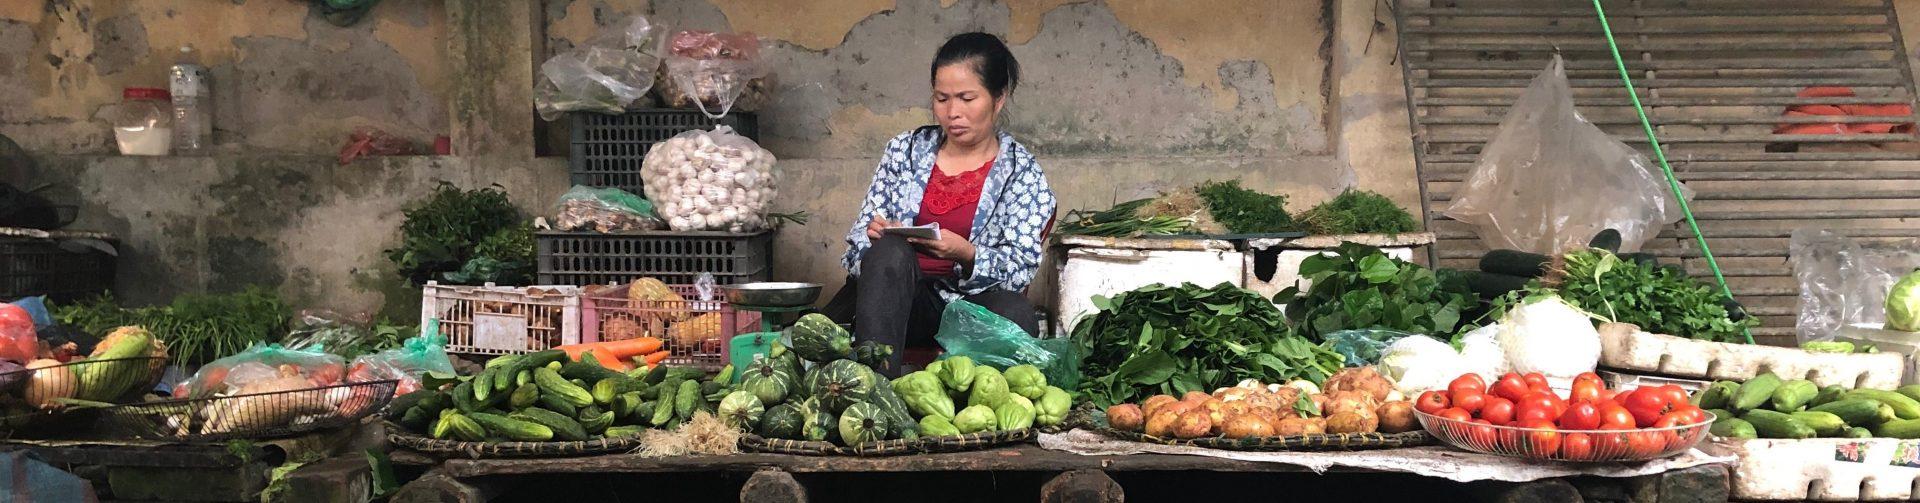 Choosing Between Supermarkets and Wet Markets